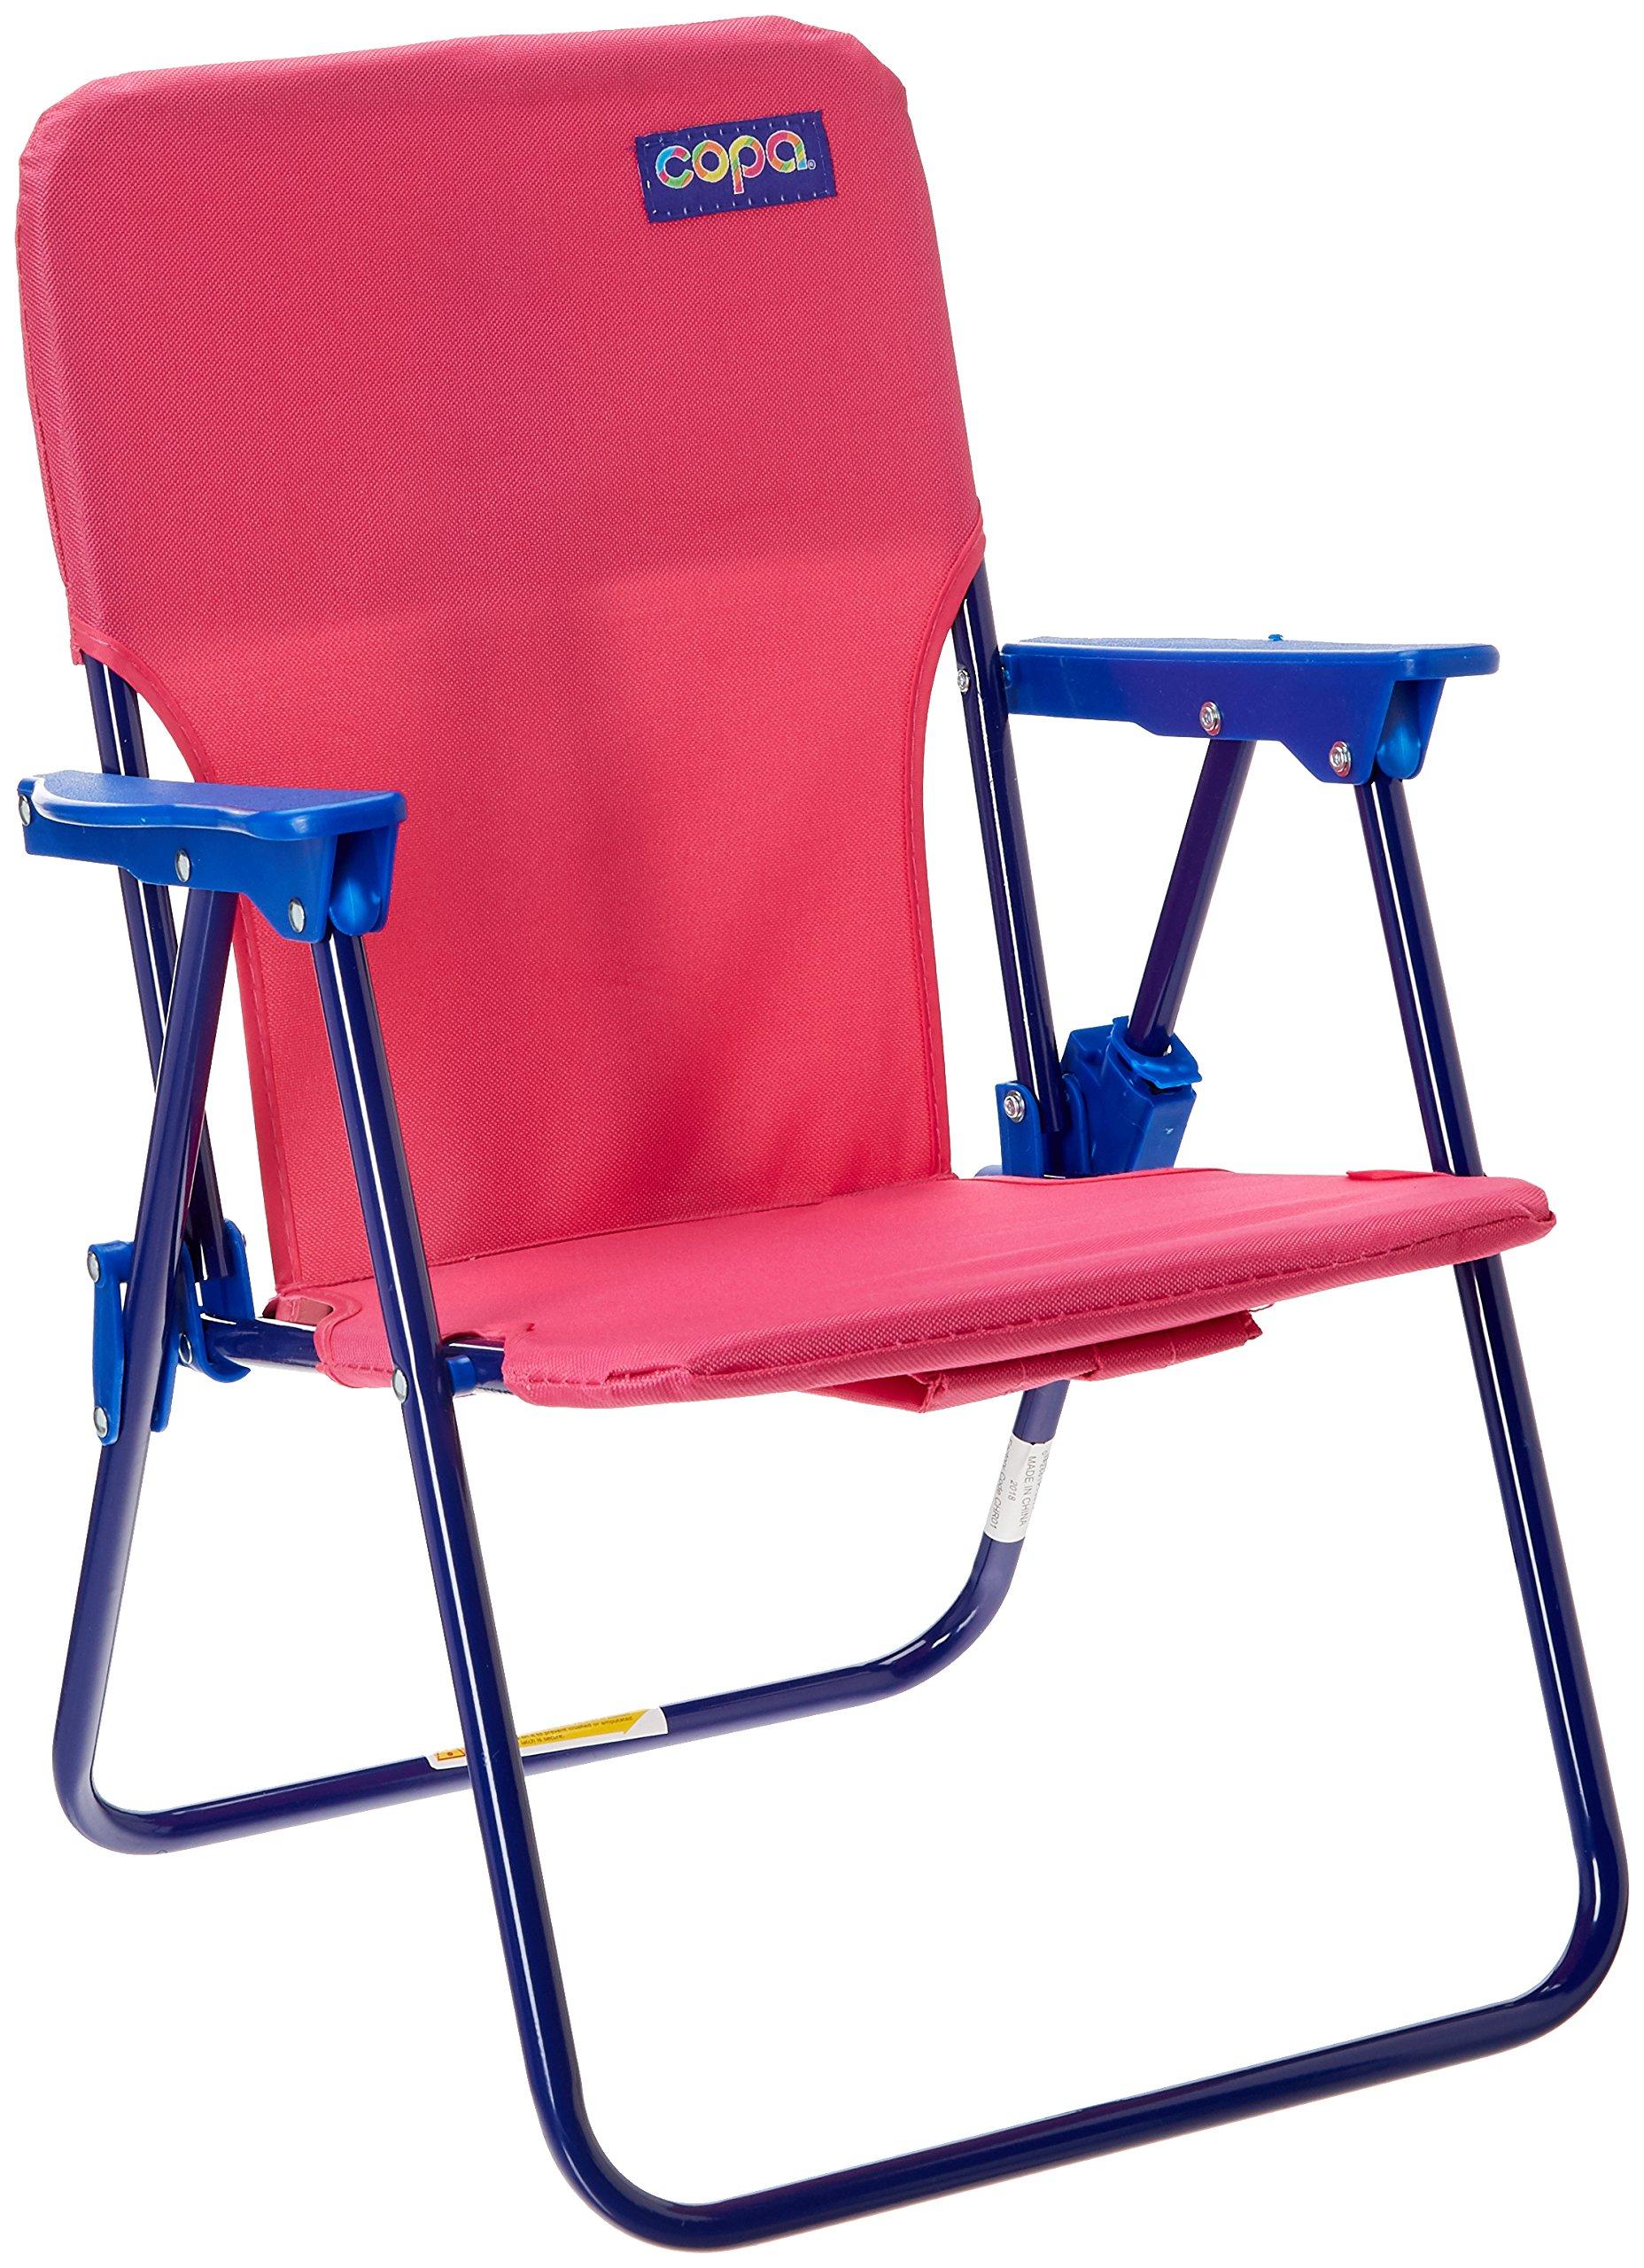 Kids Folding Backpack Beach Chair - Pink